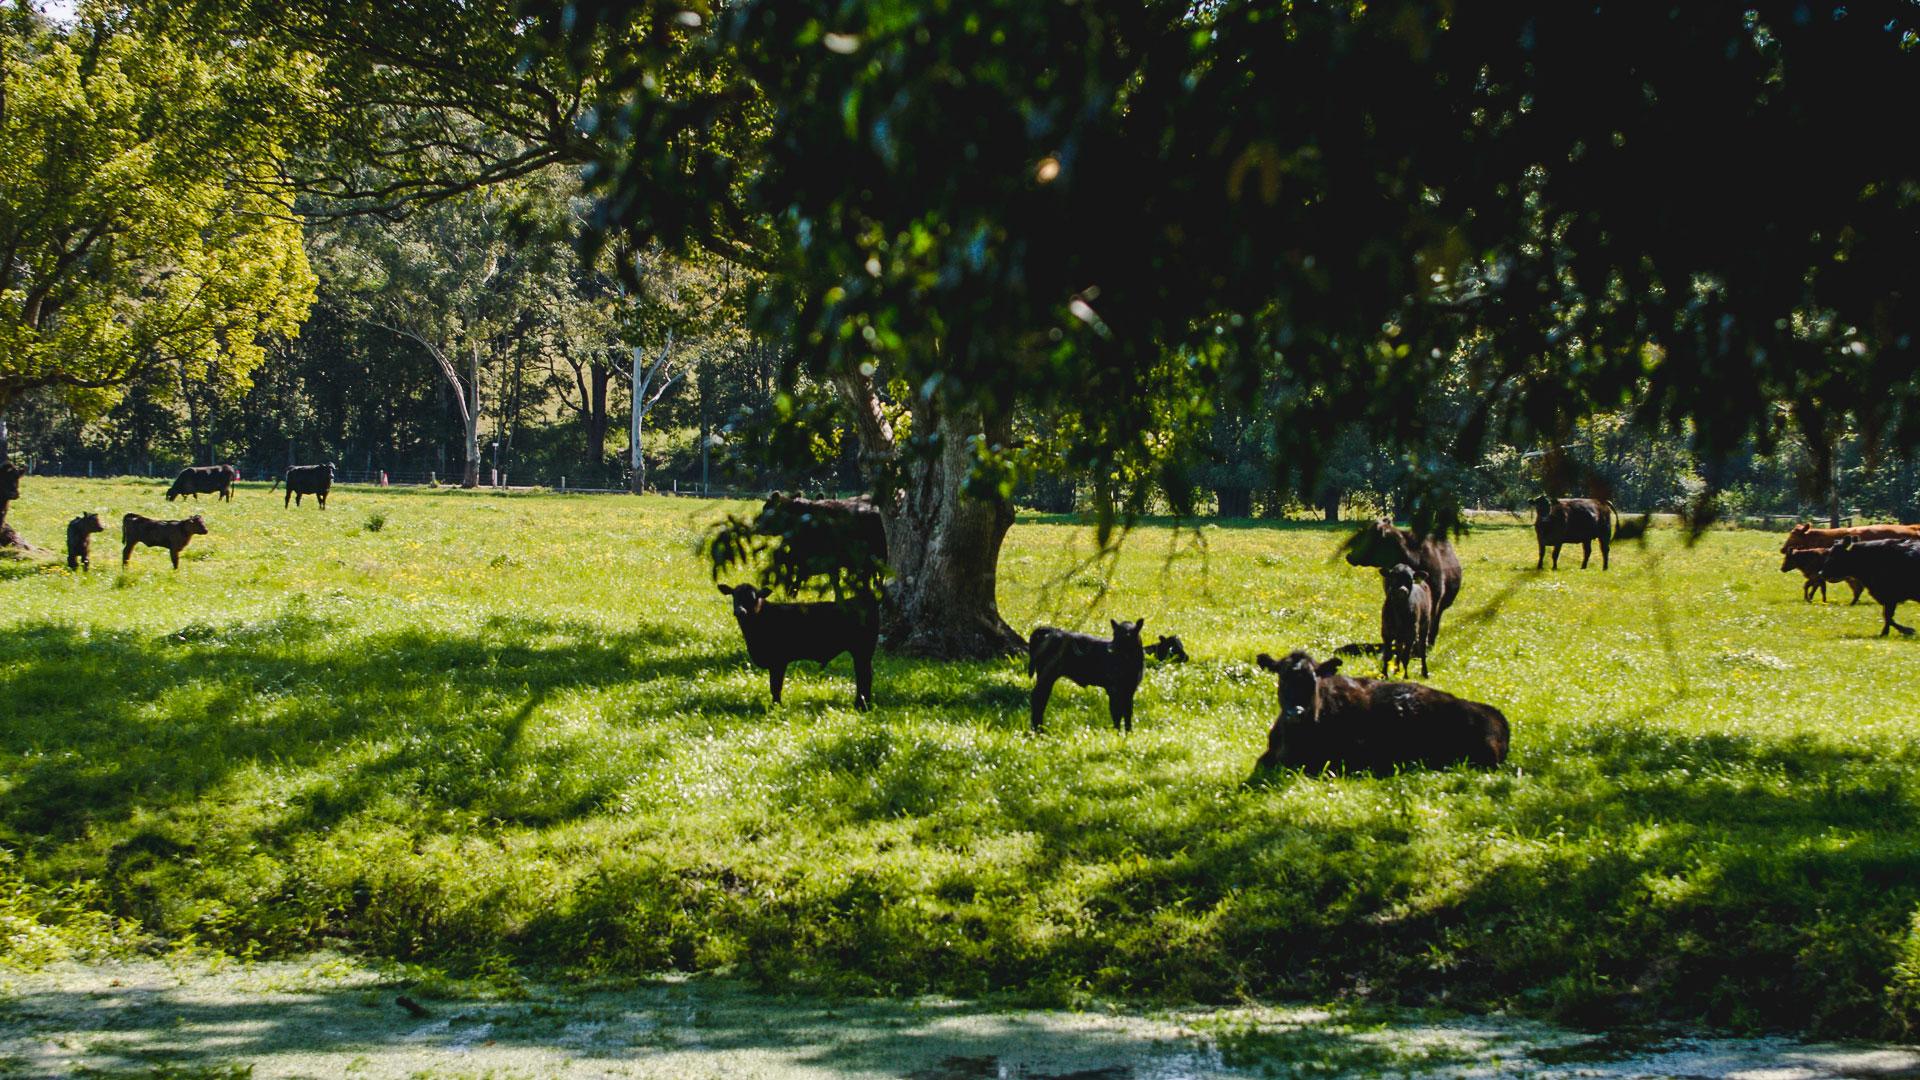 Camden Haven Farmers – Sean Gleeson